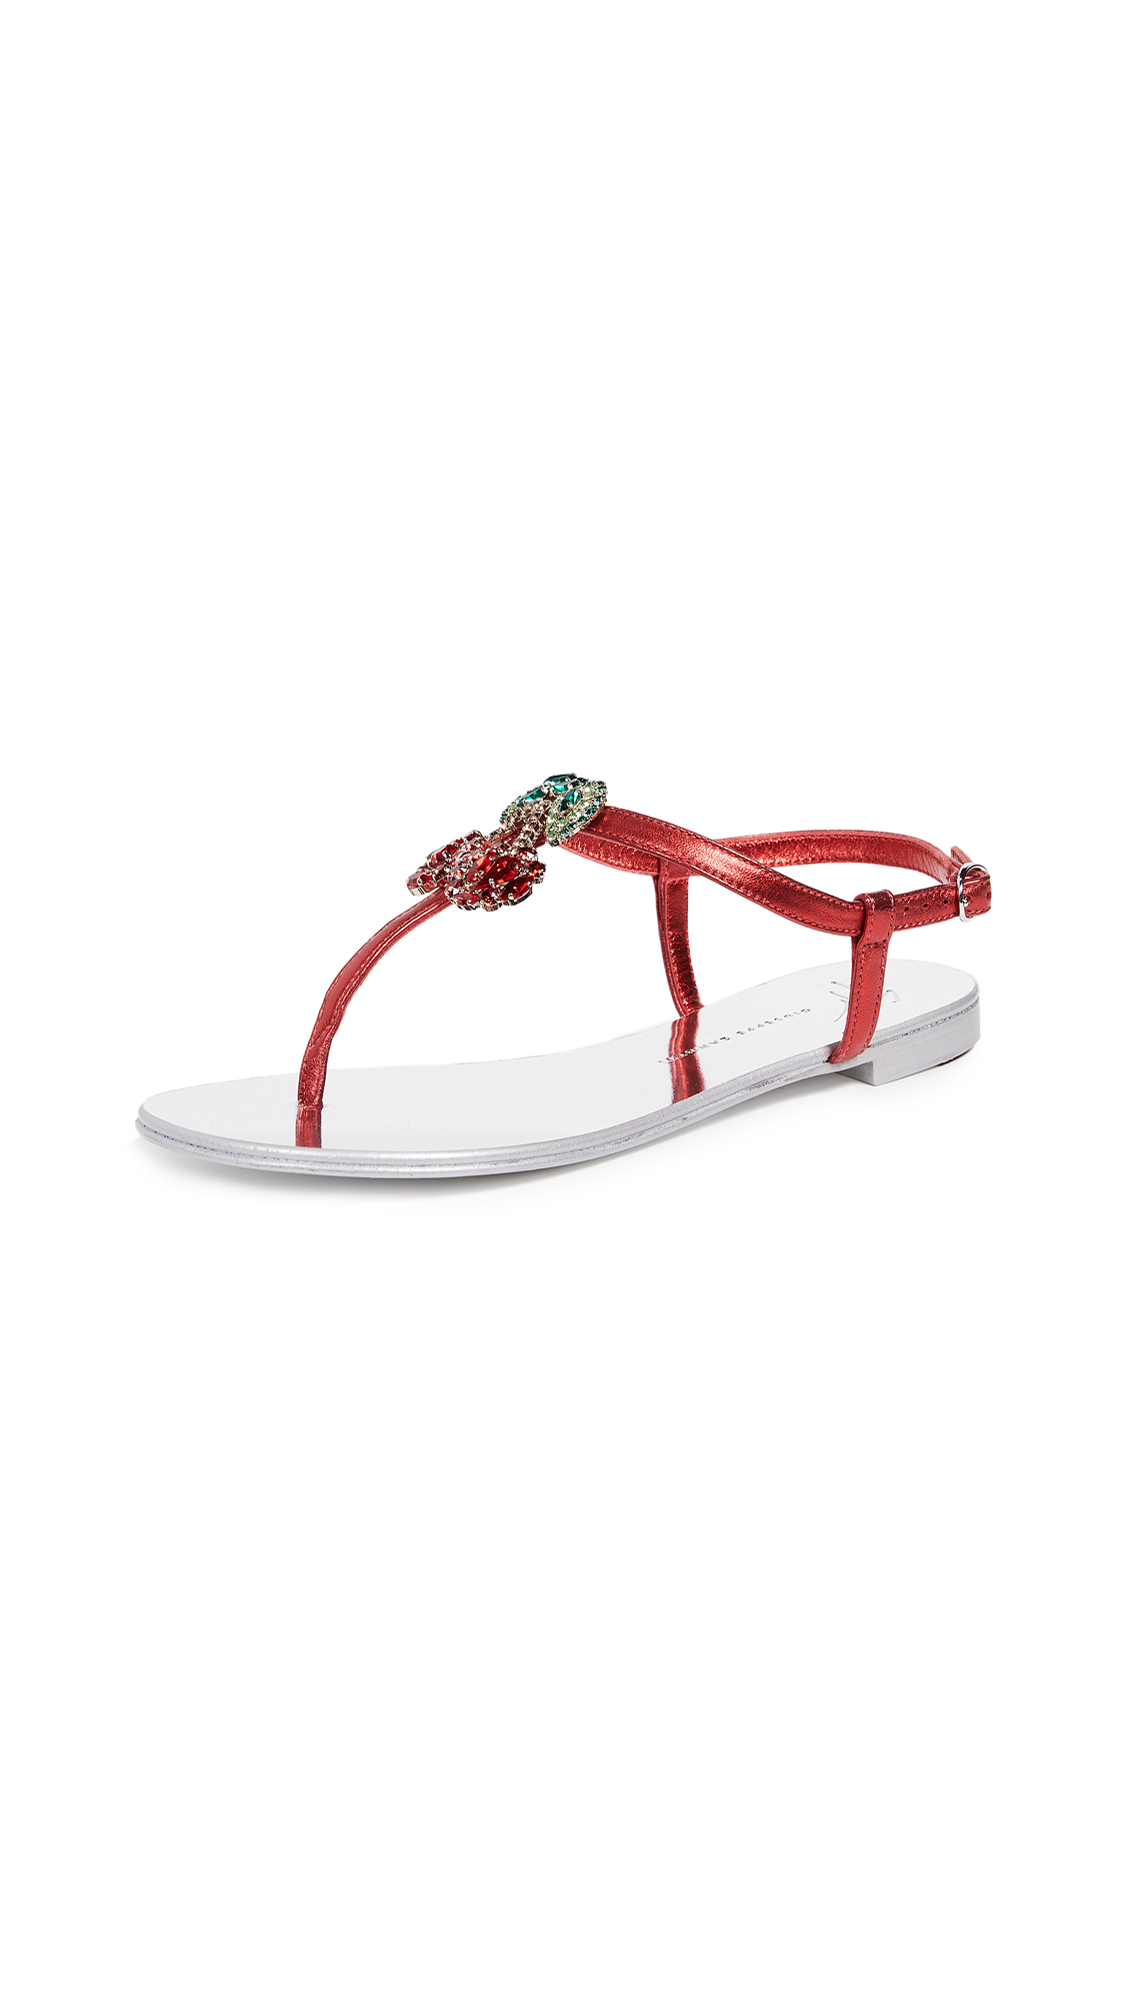 Giuseppe Zanotti Nuvrock 10 Sandals - Fragola